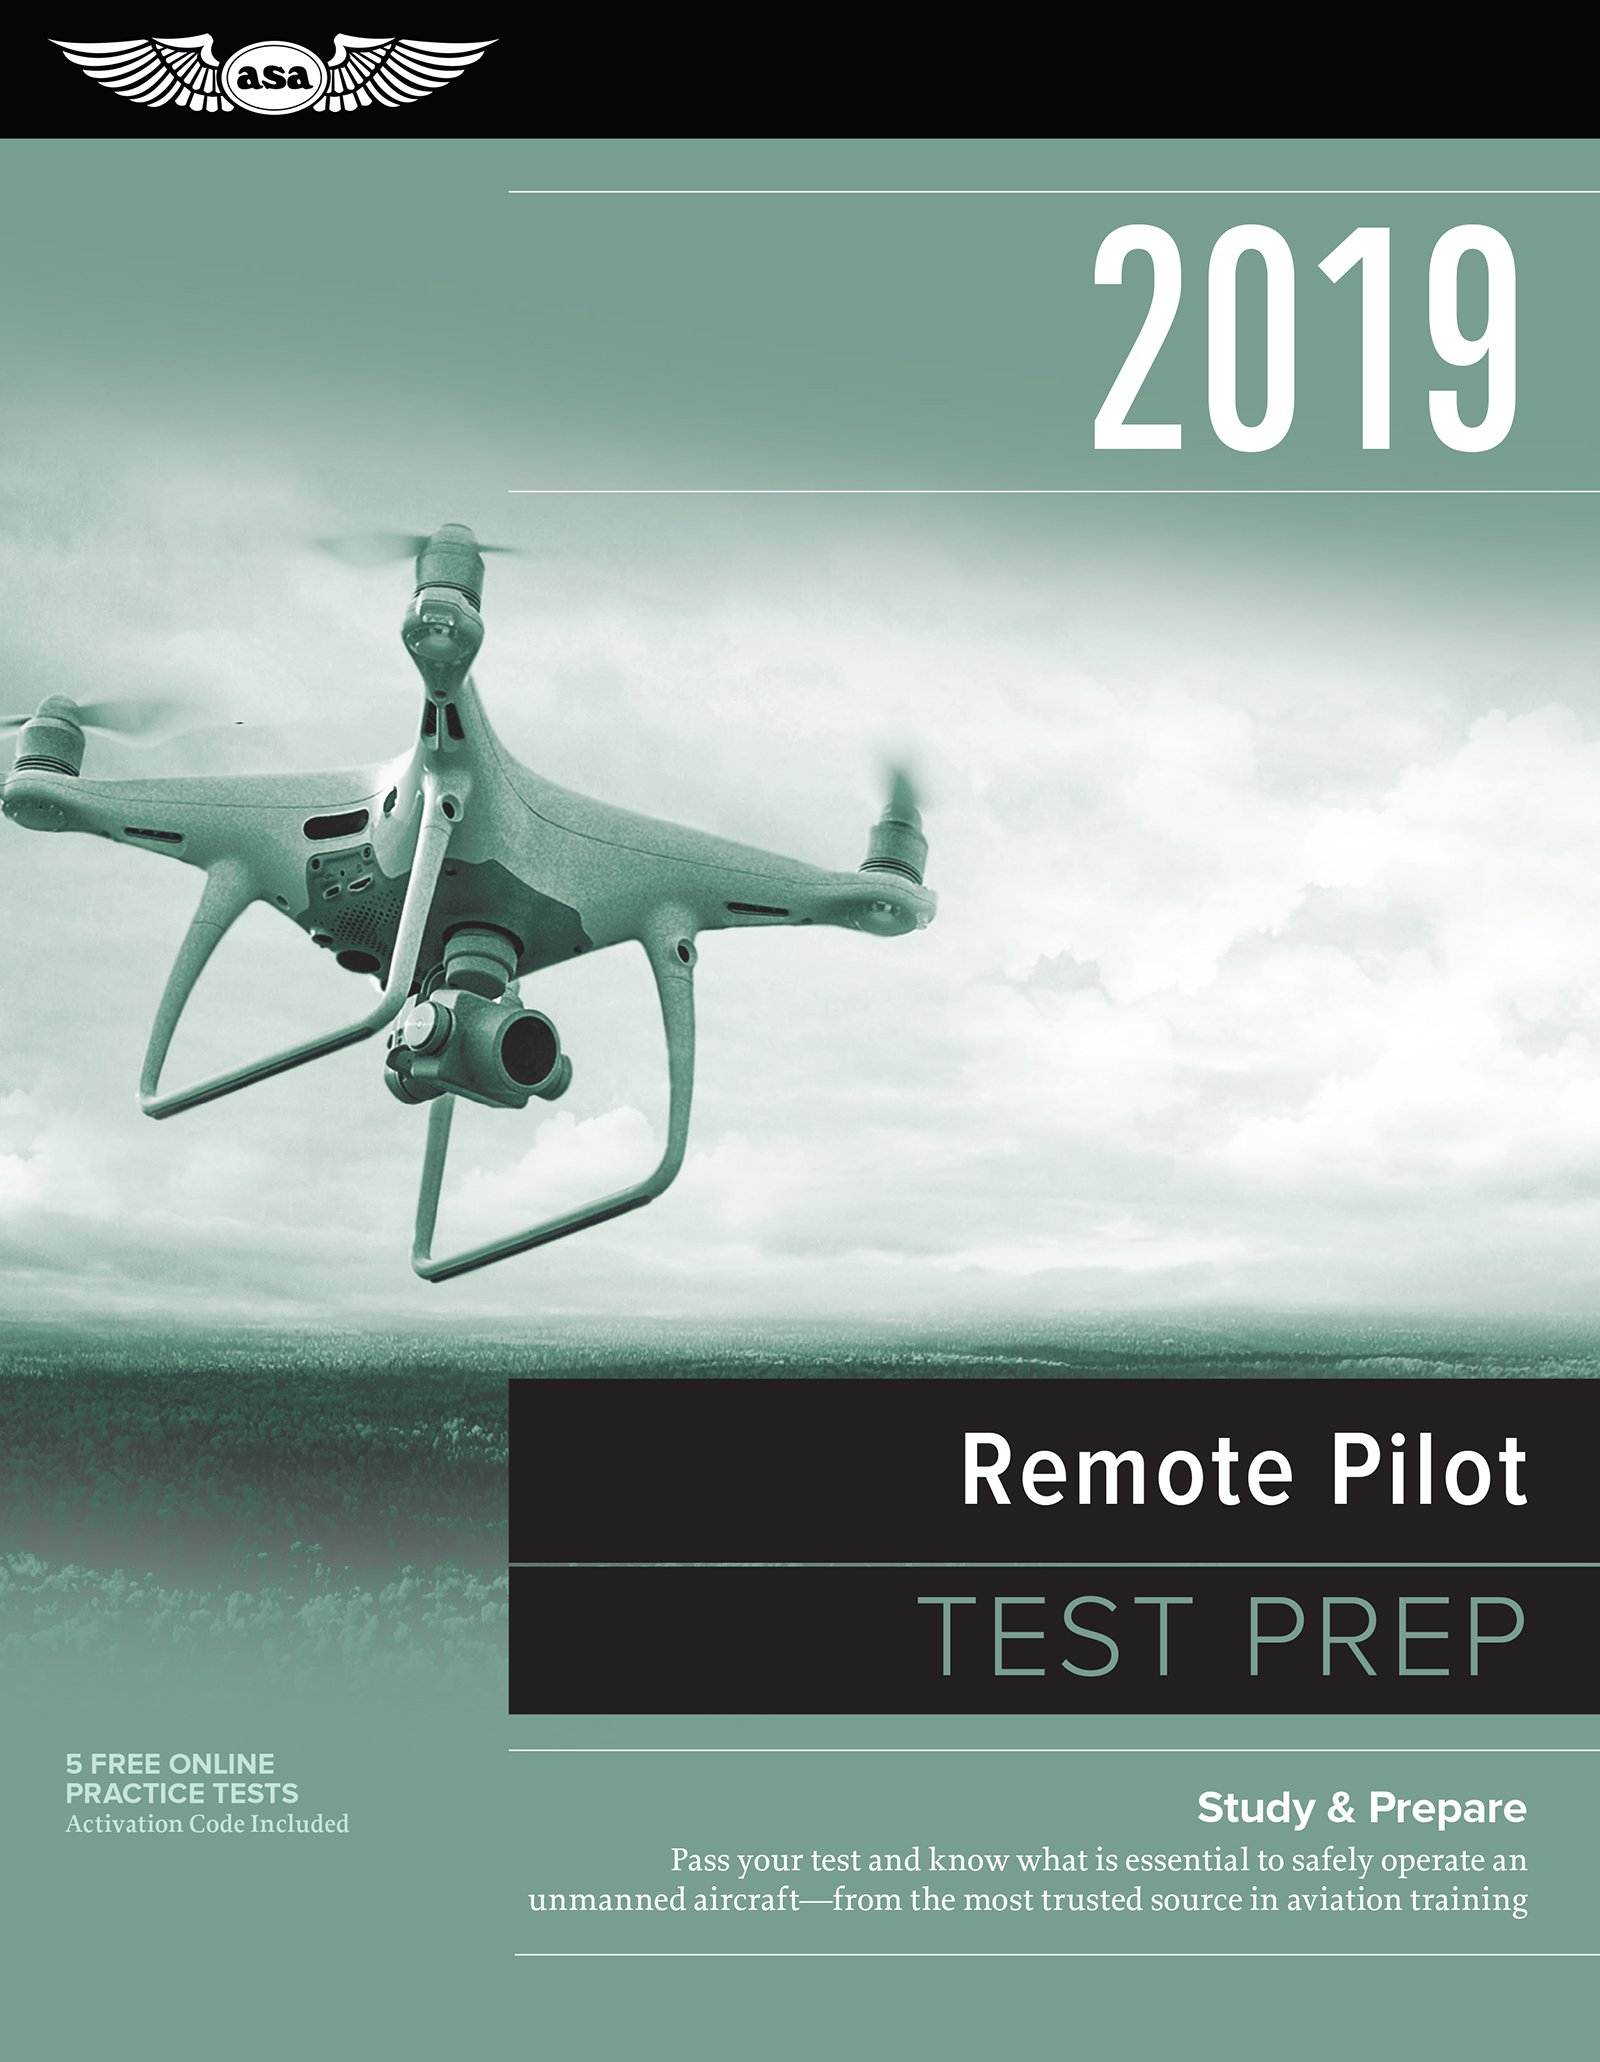 Remote Pilot Test Prep 2019: Study & Prepare: Pass your test